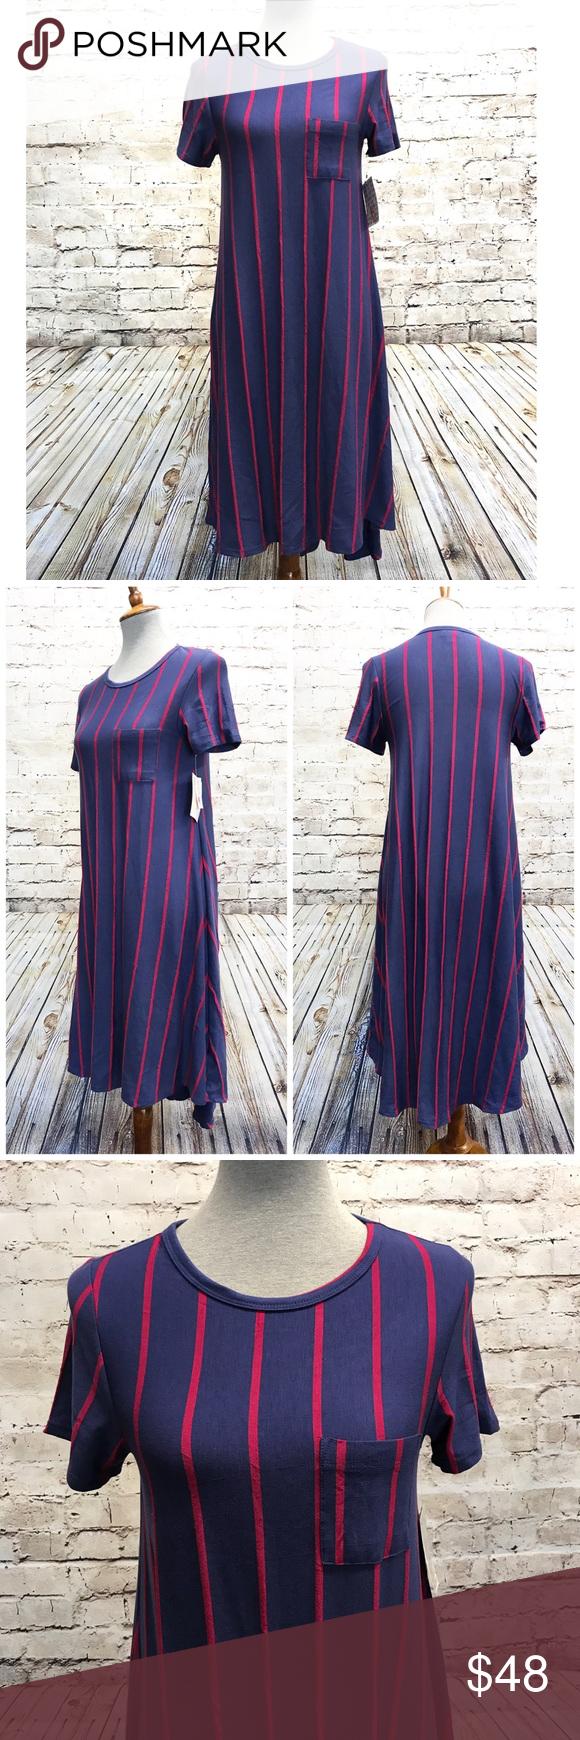 Lularoe carly red blue vertical stripe nwt dress nwt my posh picks